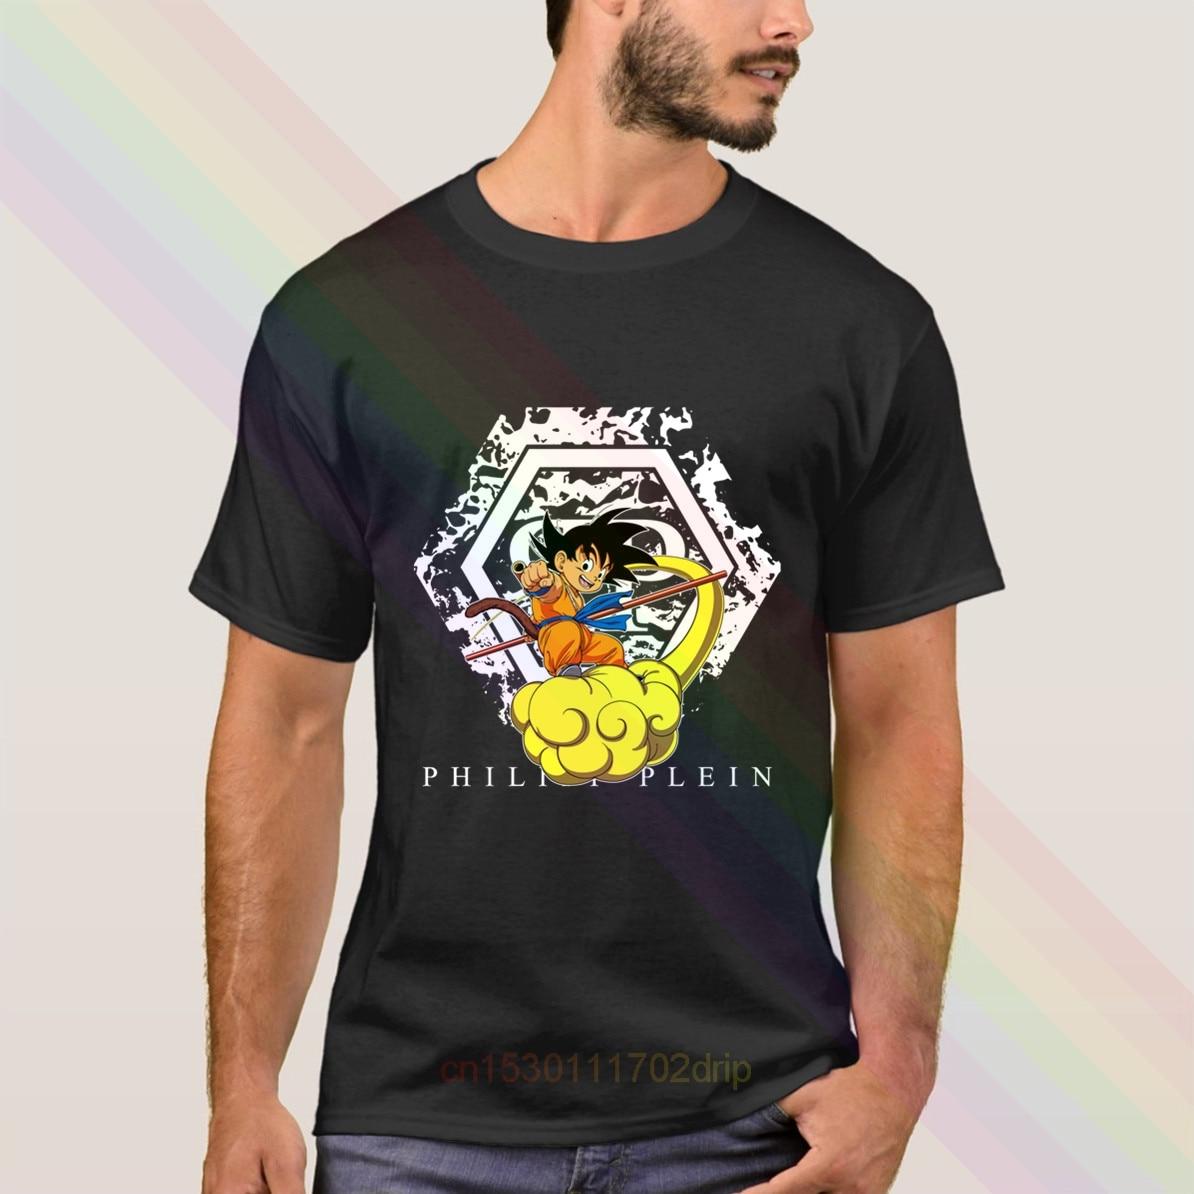 Dragon Ball Goku Kintoun Plein camiseta 2020 más reciente verano hombres de manga corta Popular camisetas Tops Unisex